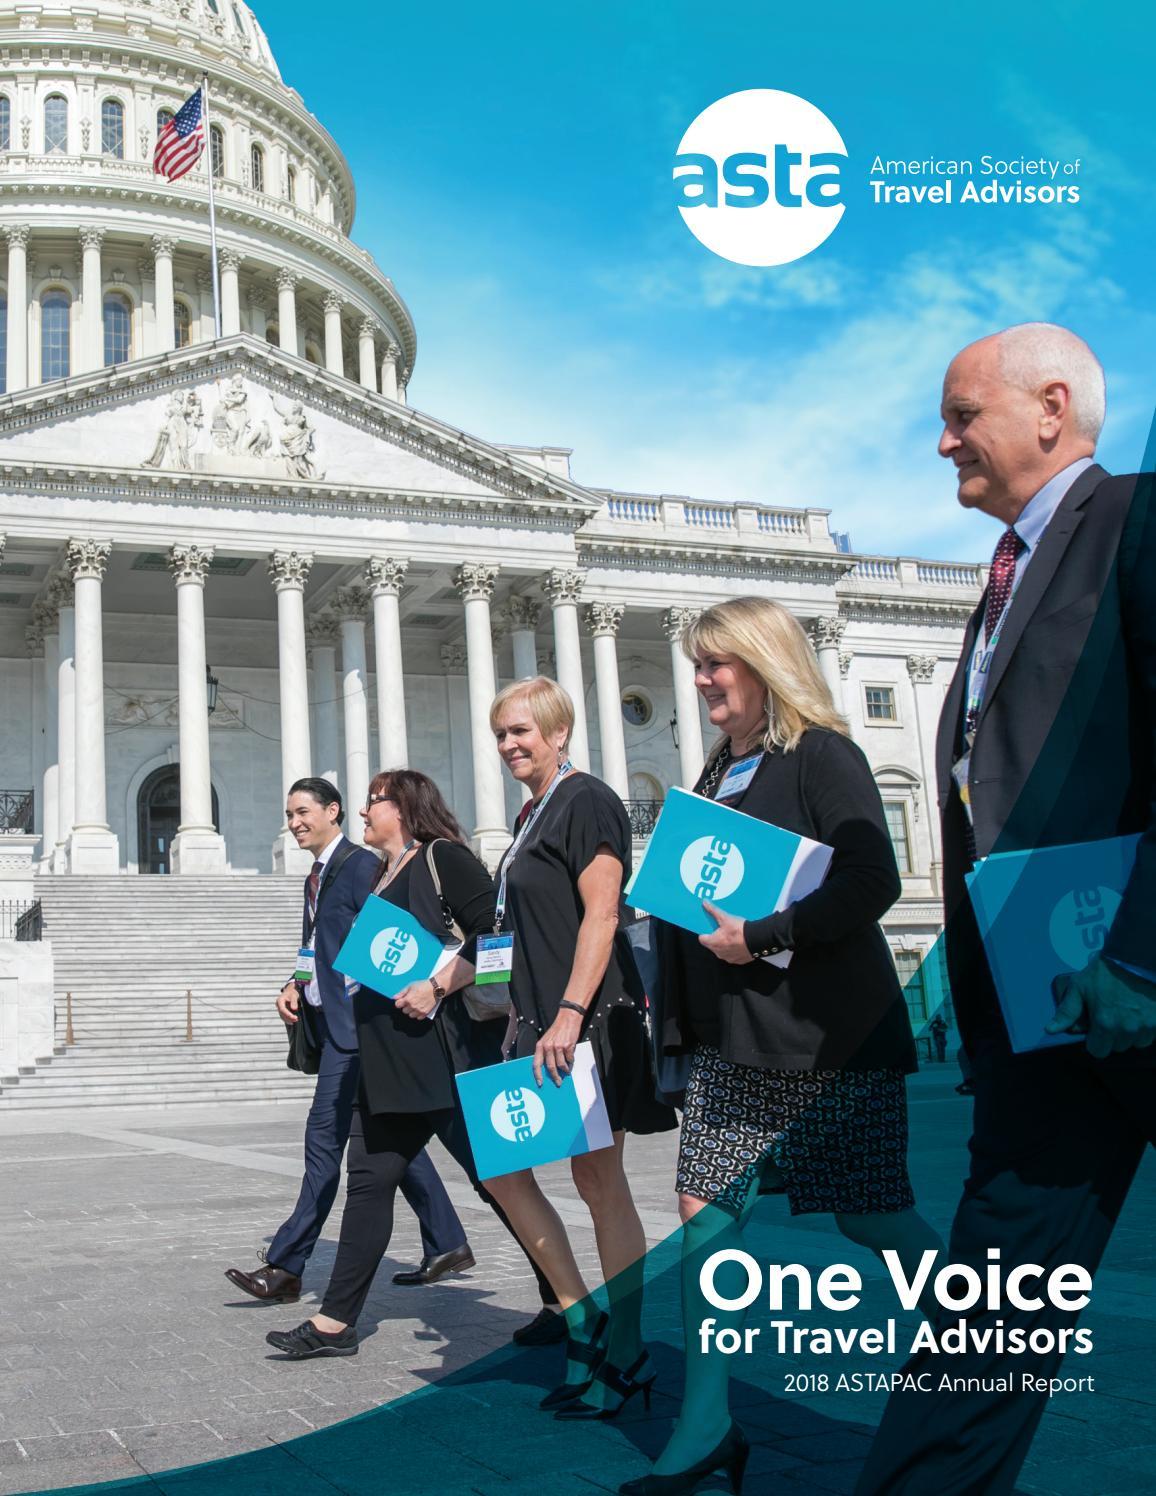 ASTA ASTAPAC 2018 Annual Report by ASTA - issuu